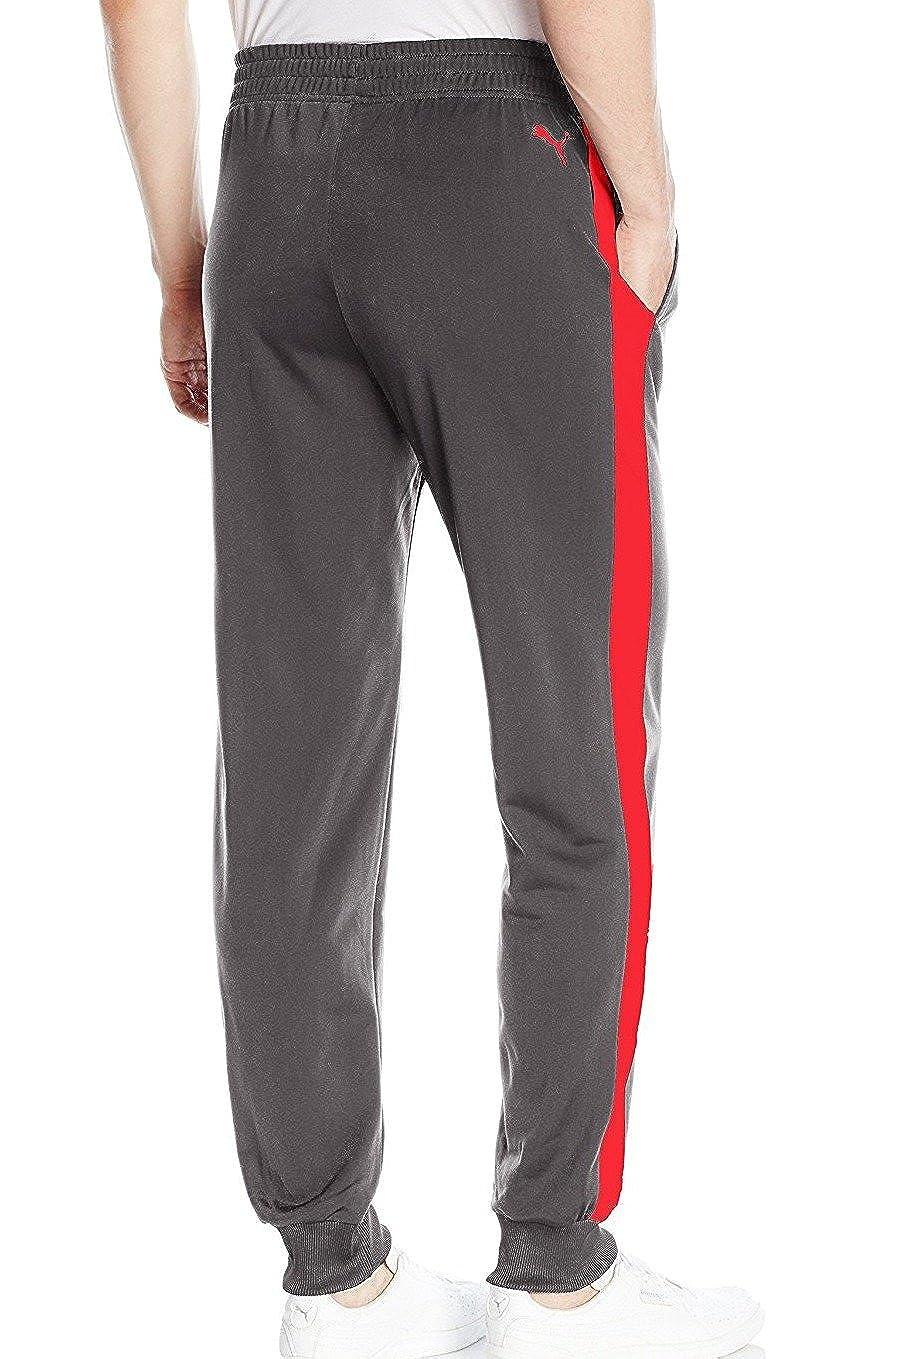 PUMA Mens Contrast Pant Cuffed Bottom